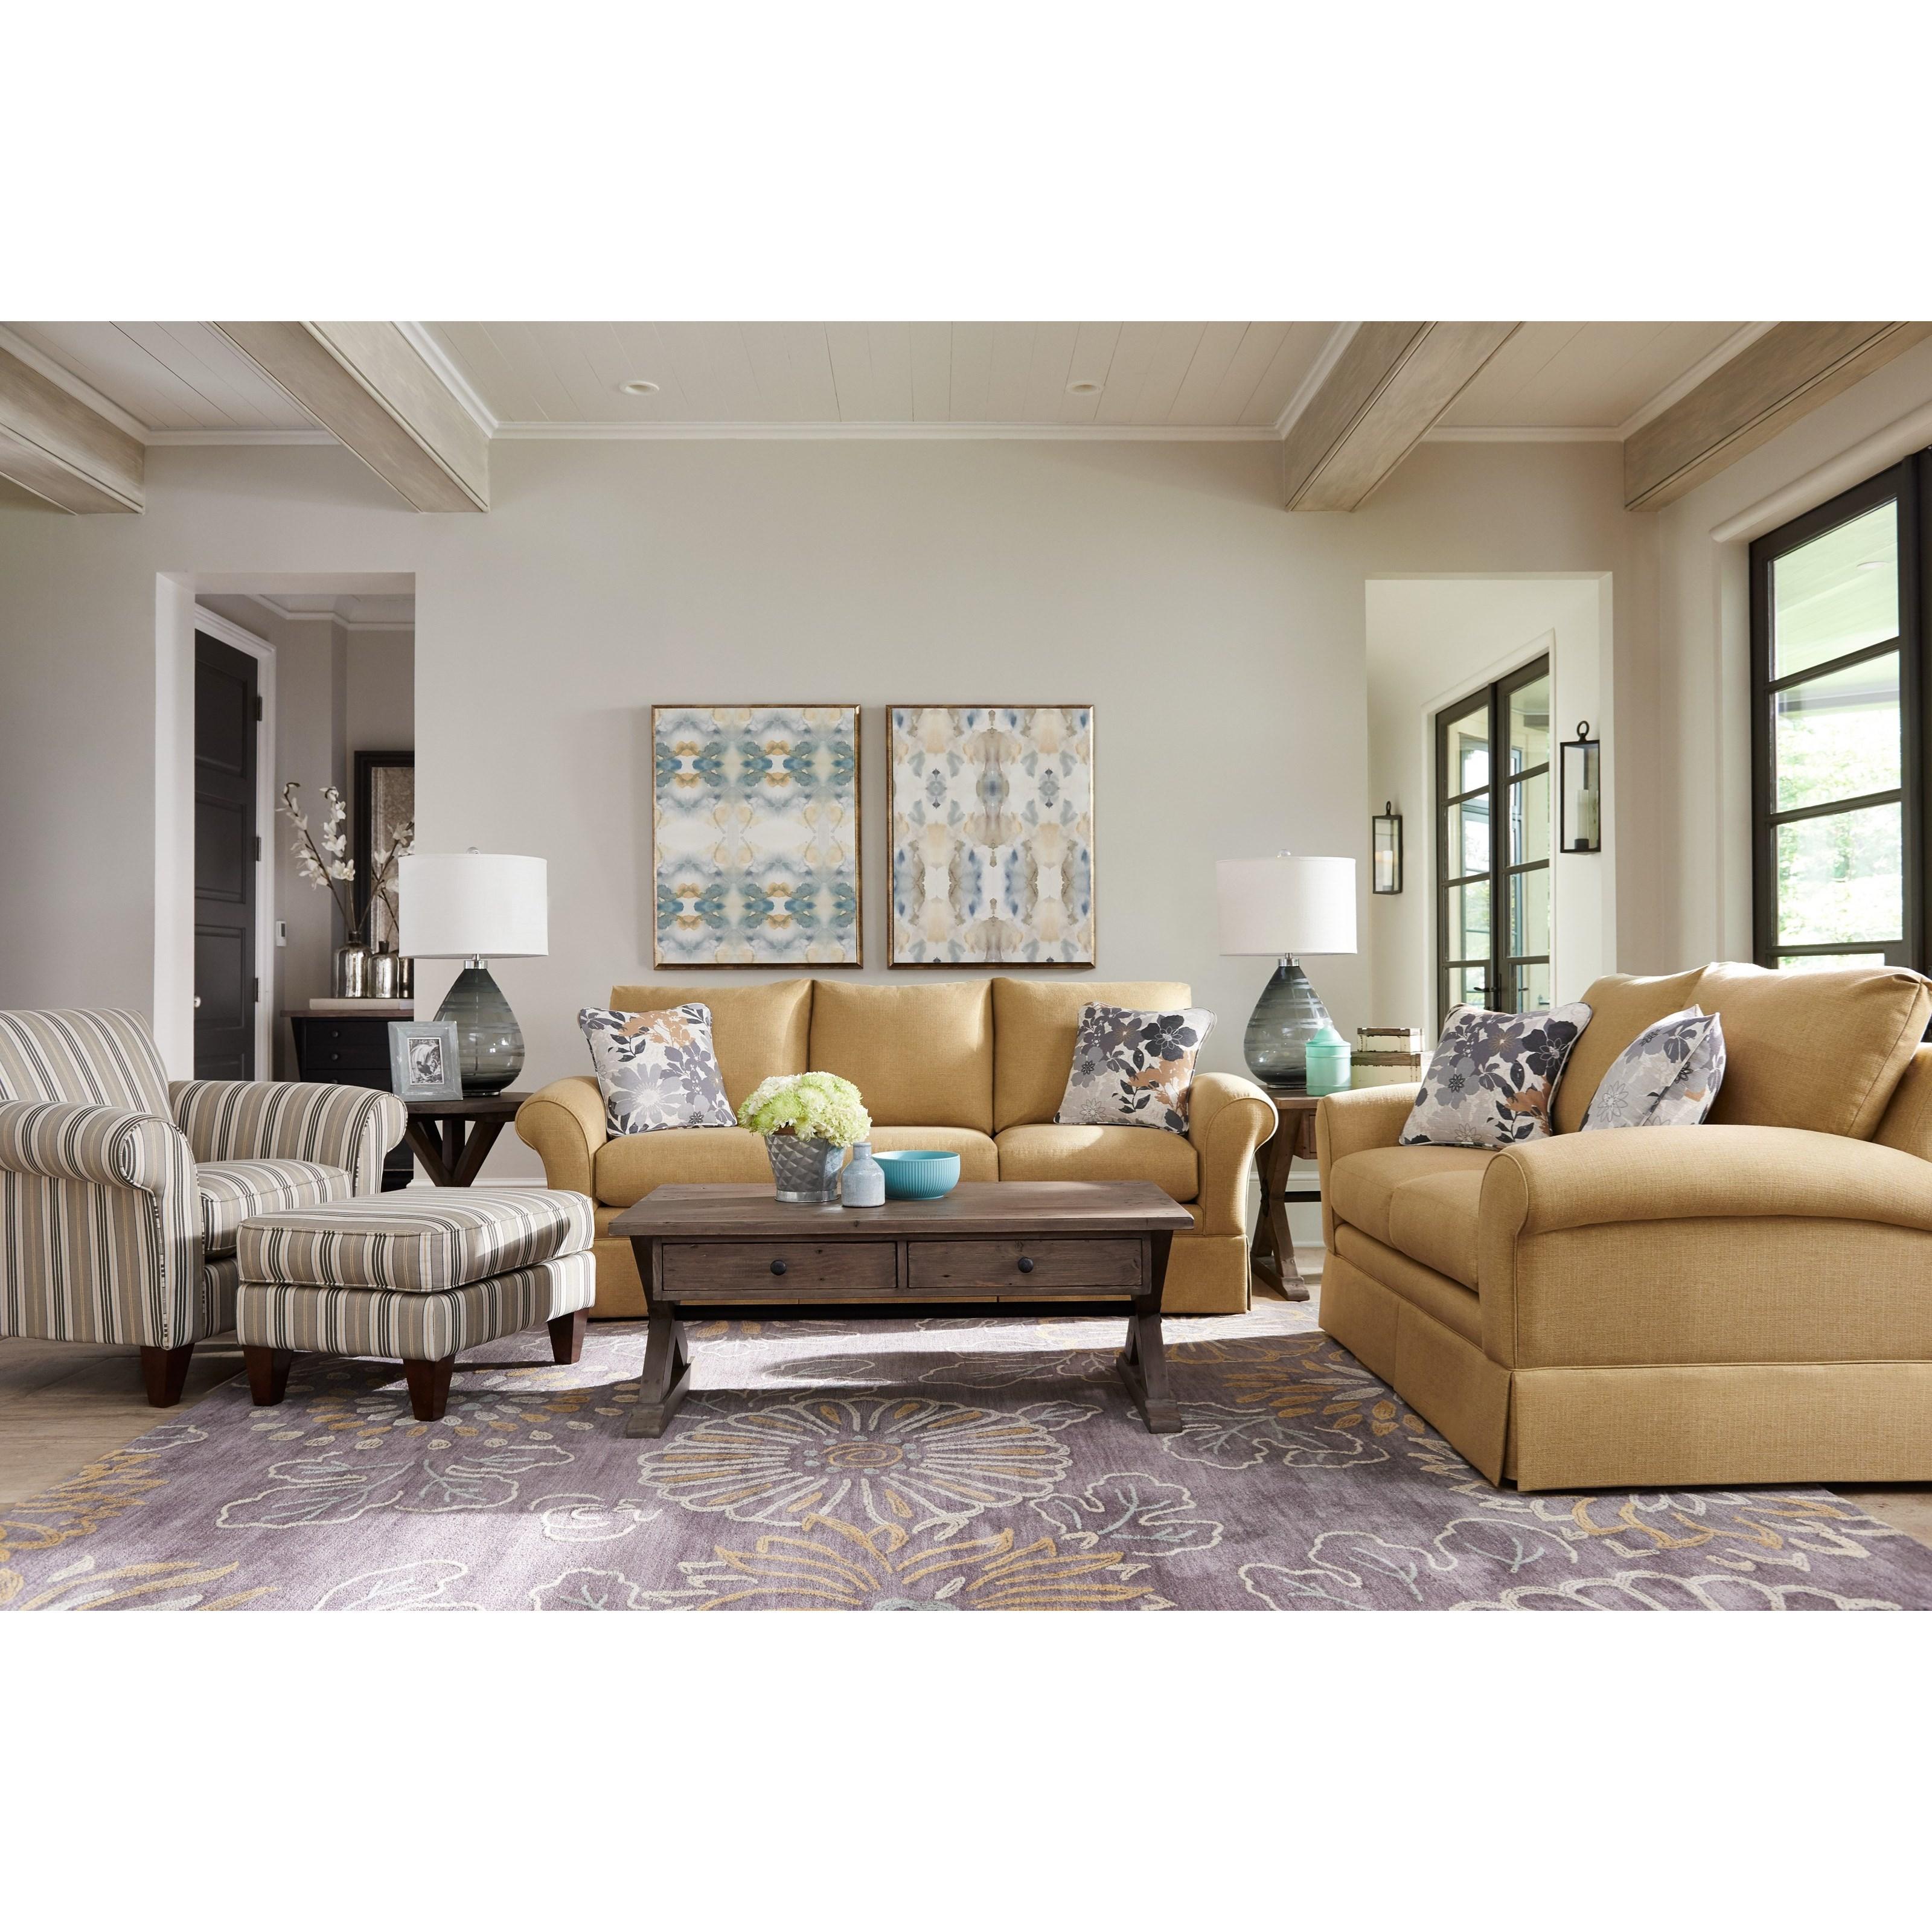 La-Z-Boy Aria Transitional Chair And Ottoman Set   Adcock Furniture   Chair U0026 Ottoman Sets